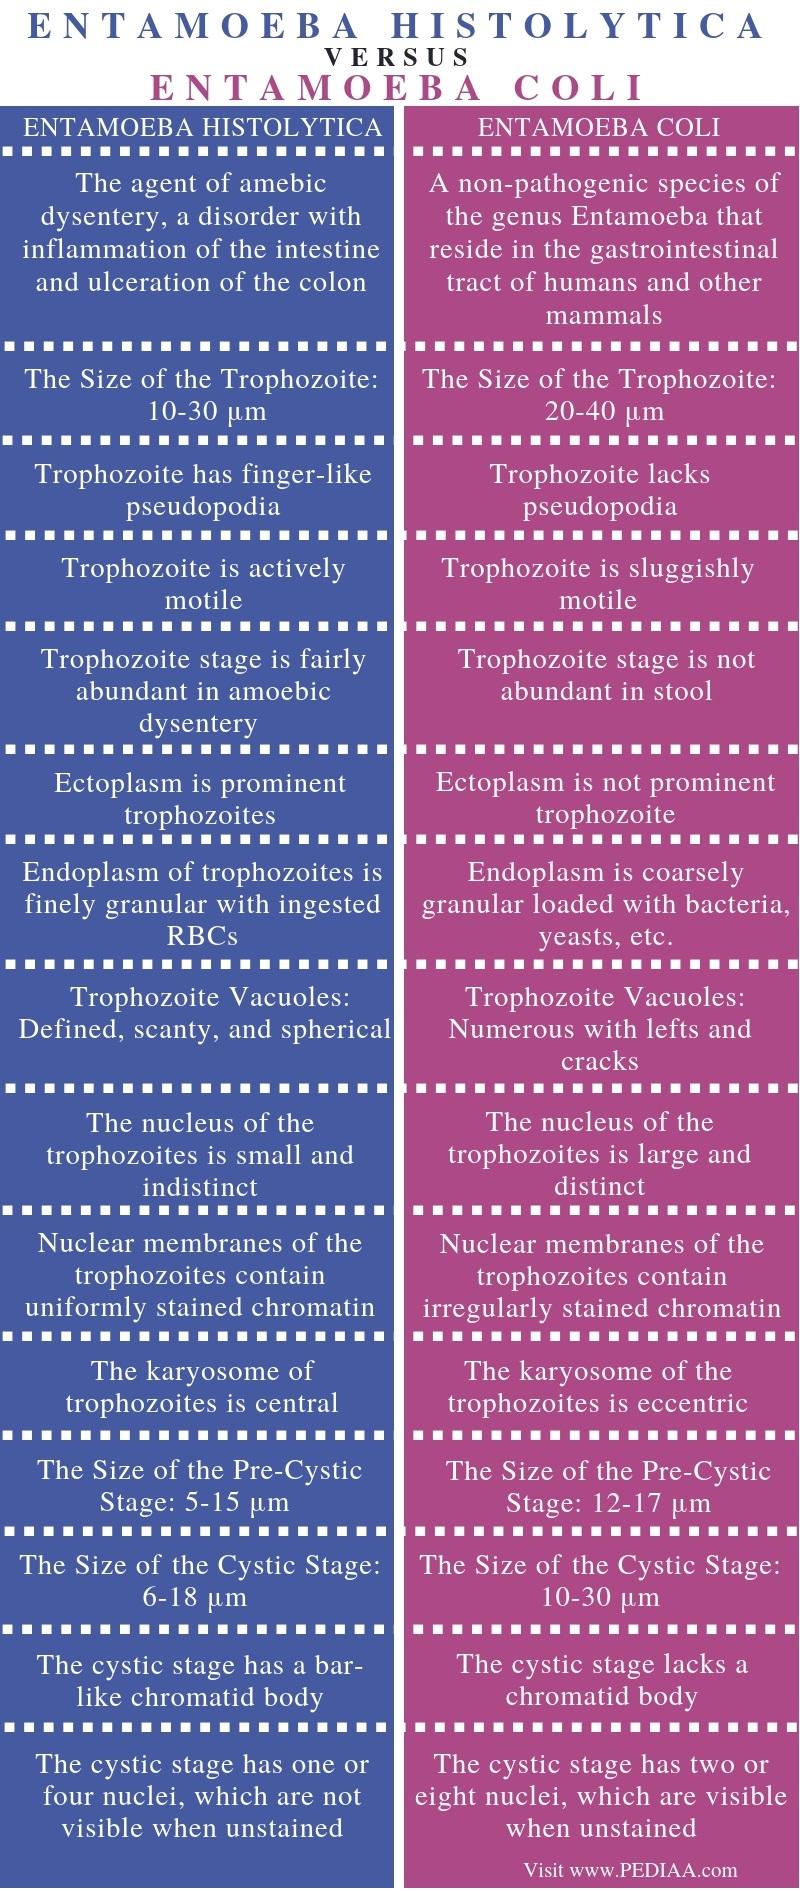 Difference Between Entamoeba Histolytica and Entamoeba Coli - Comparison Summary